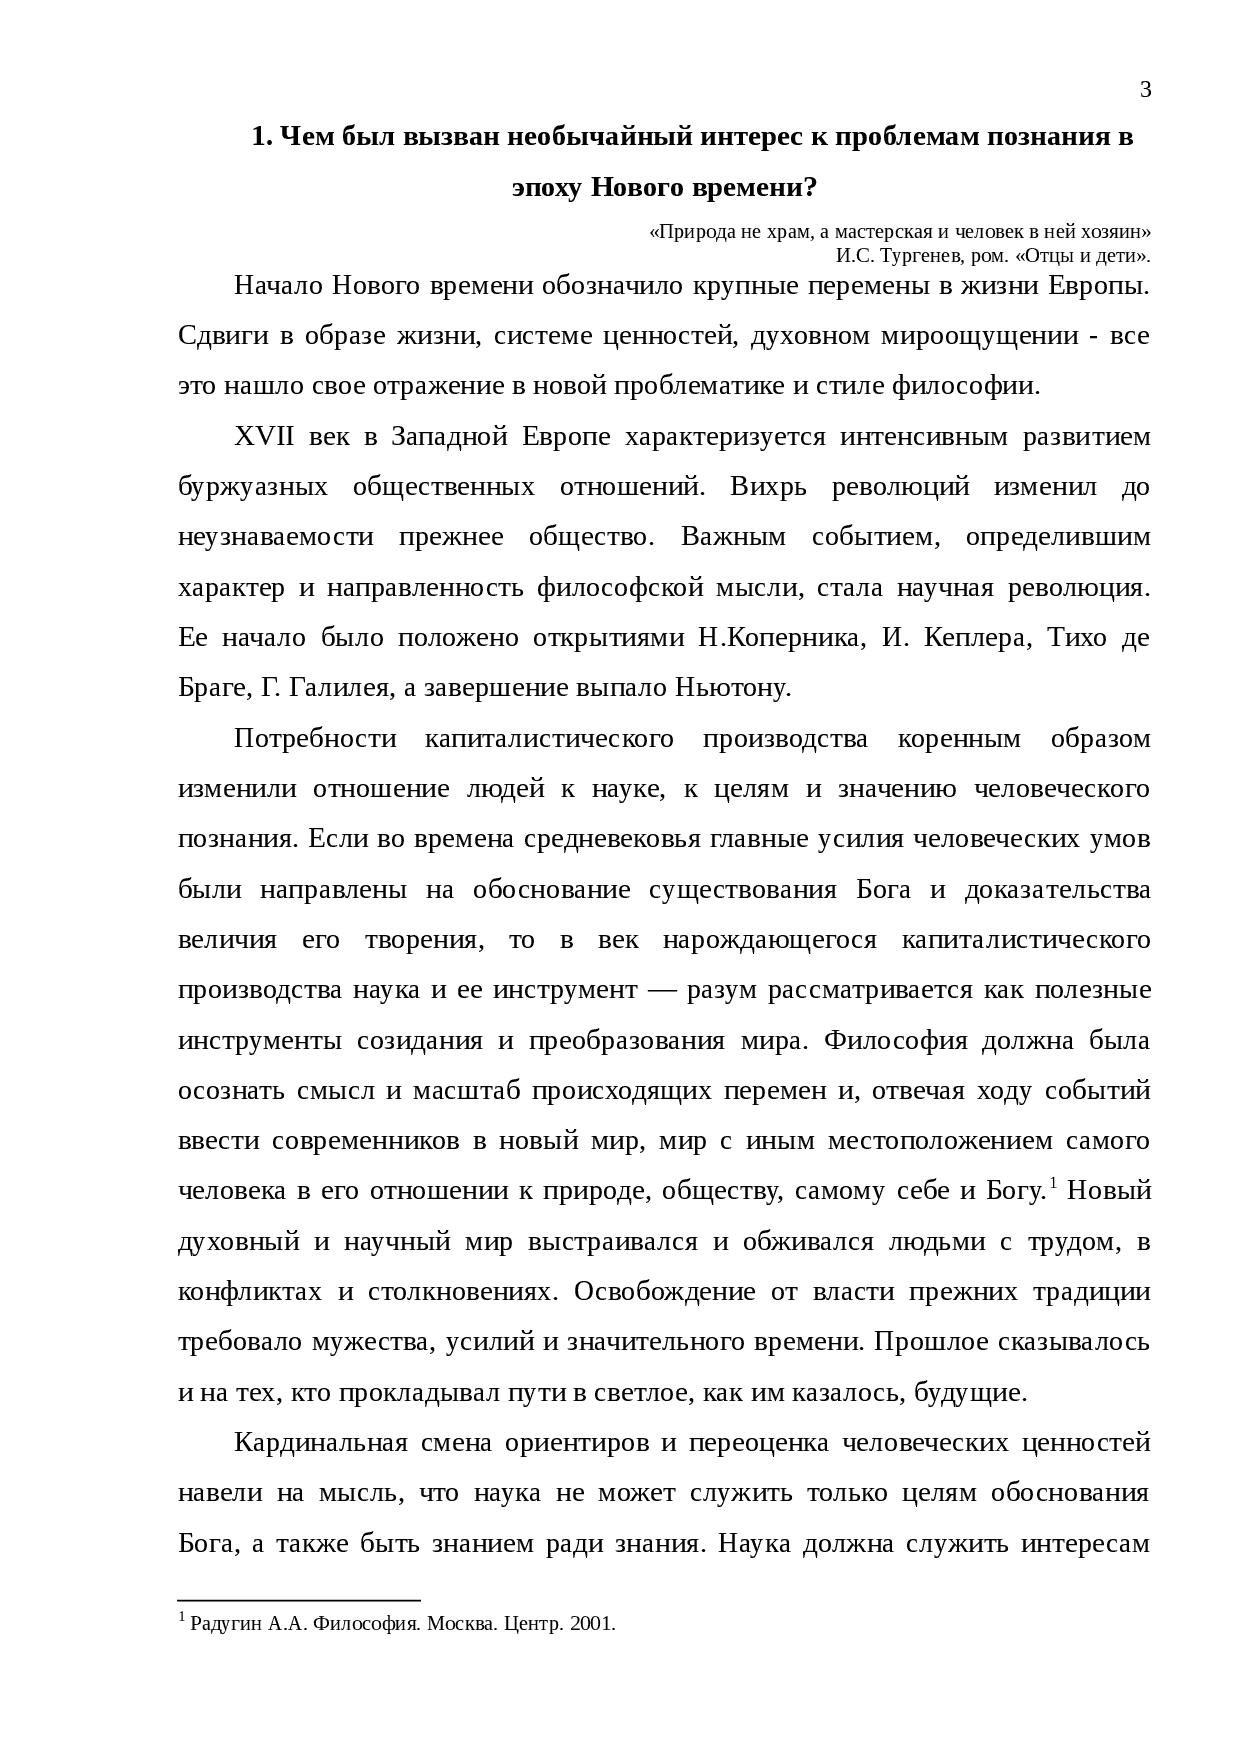 Эмпиризм — википедия (с комментариями)